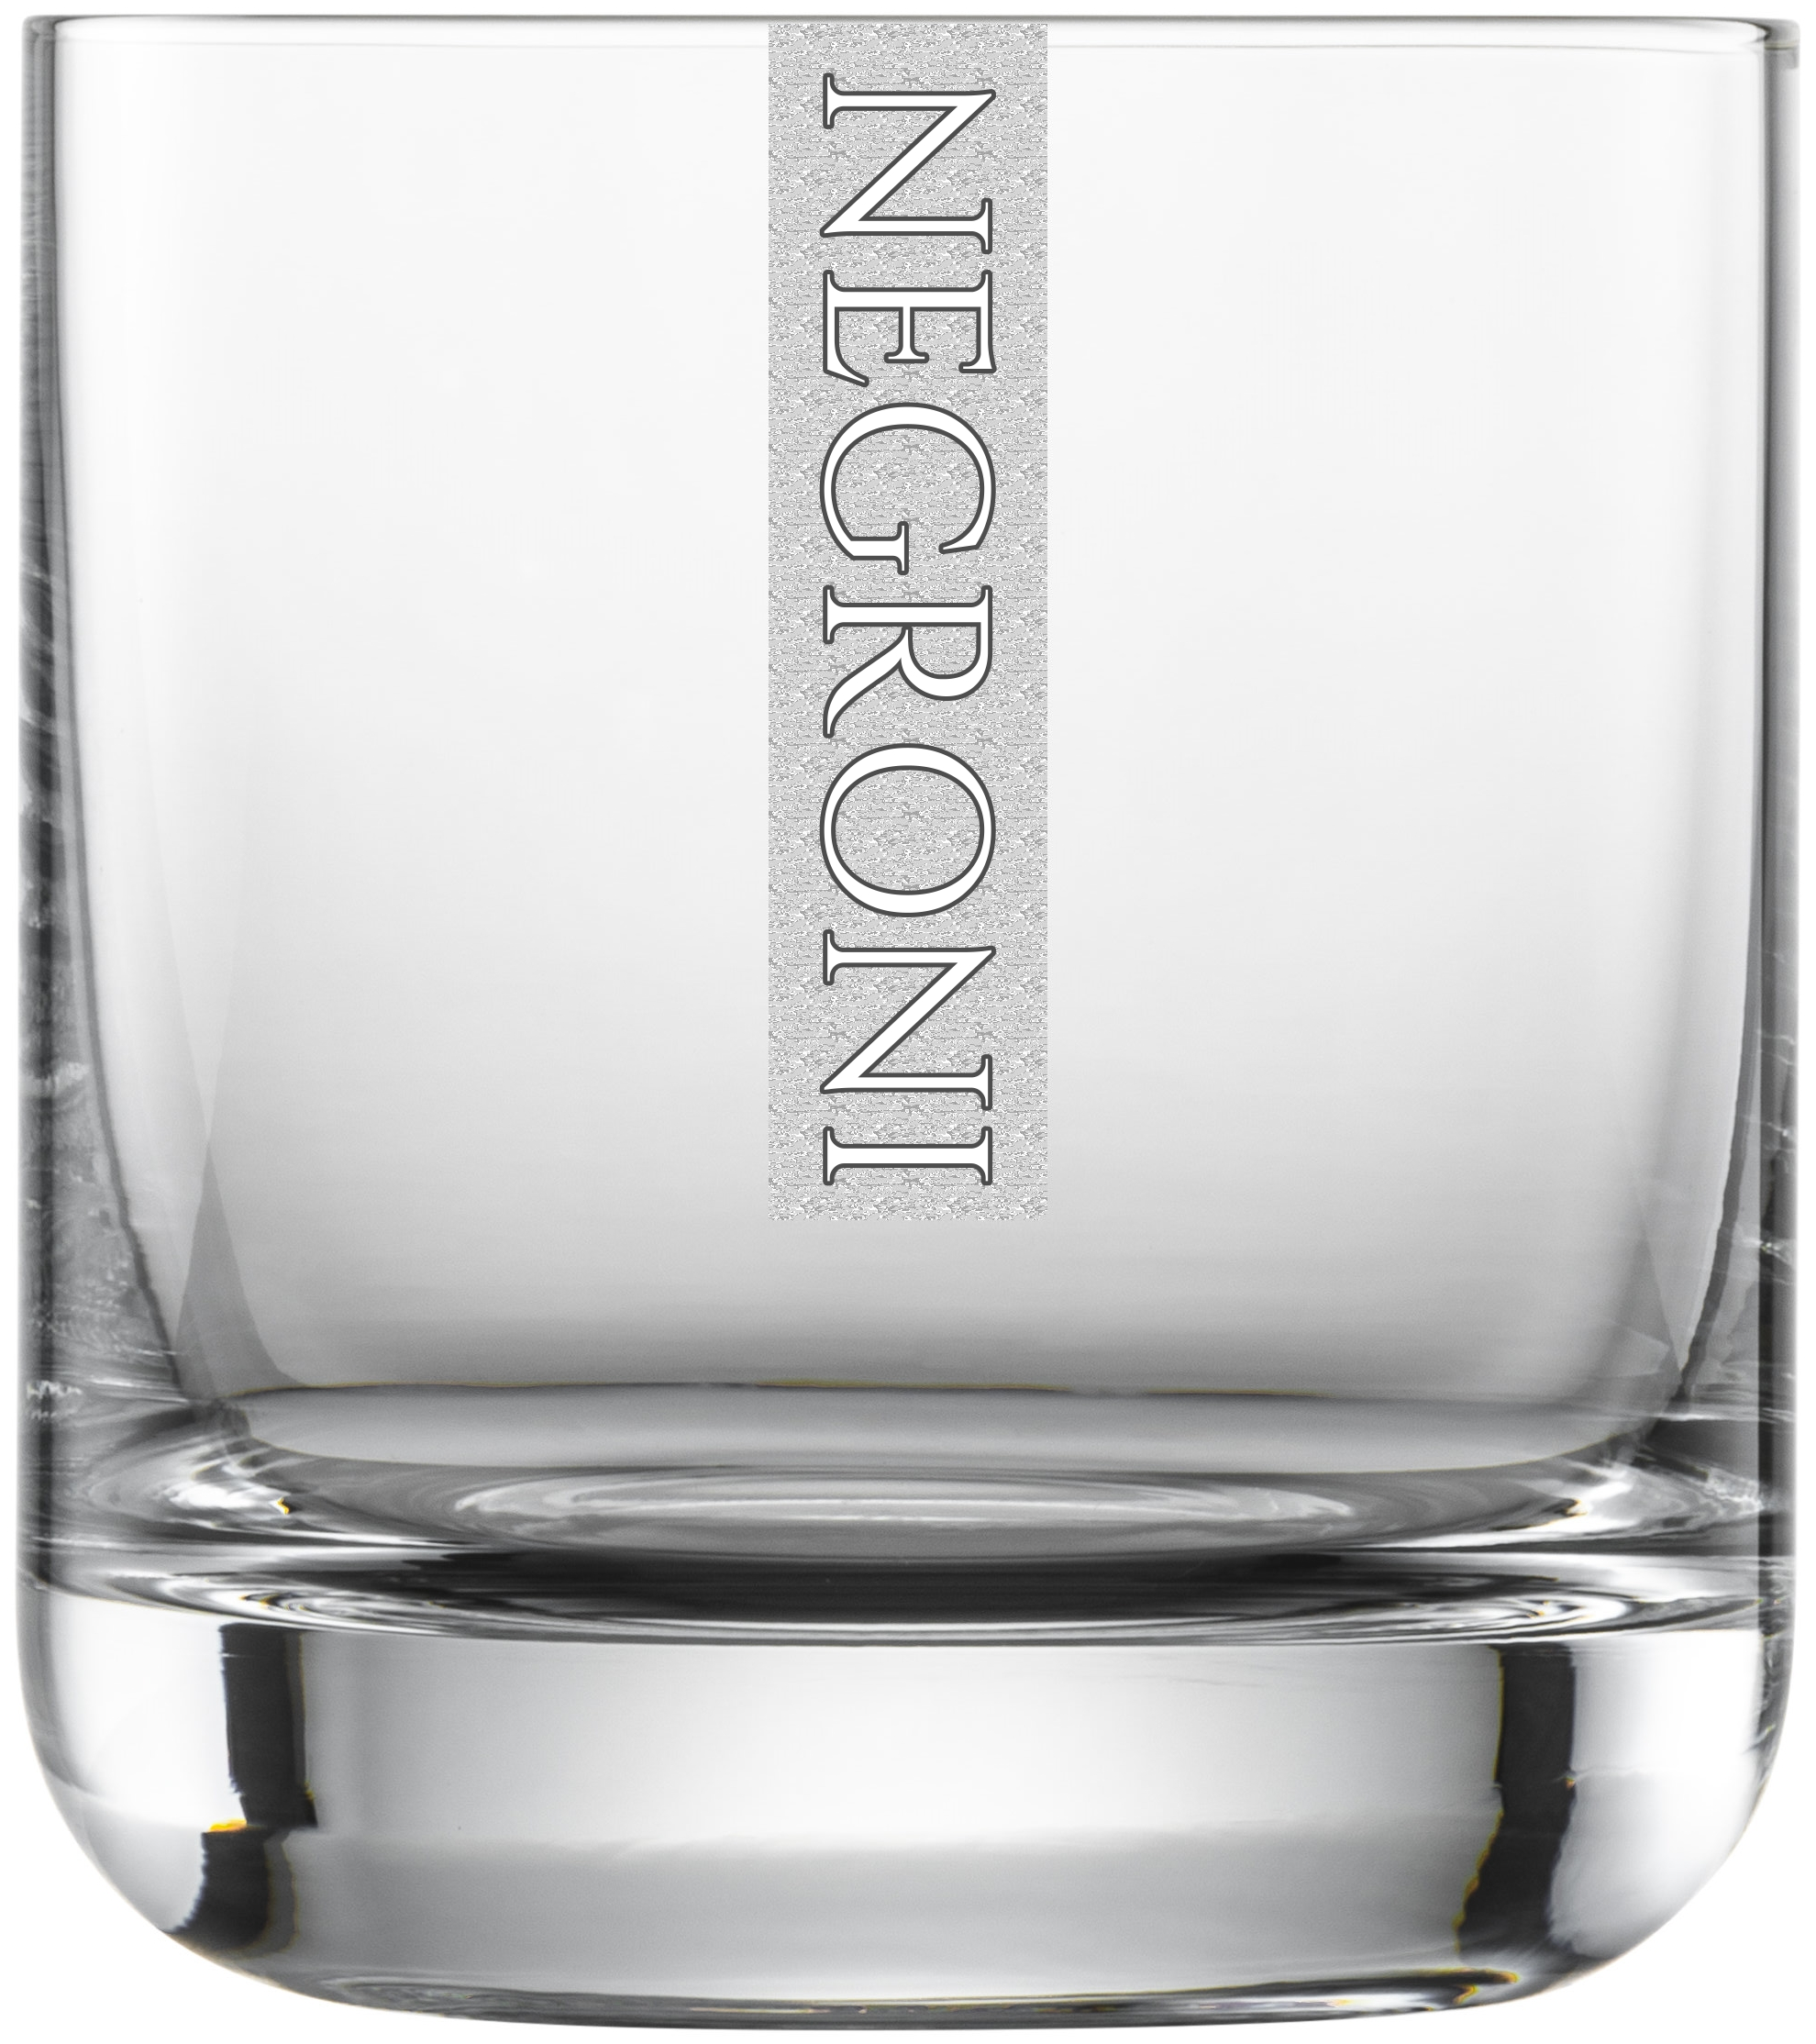 NEGRONI Gläser | 6 Stück 300ml Schott Tumblerglas | CoolGlas